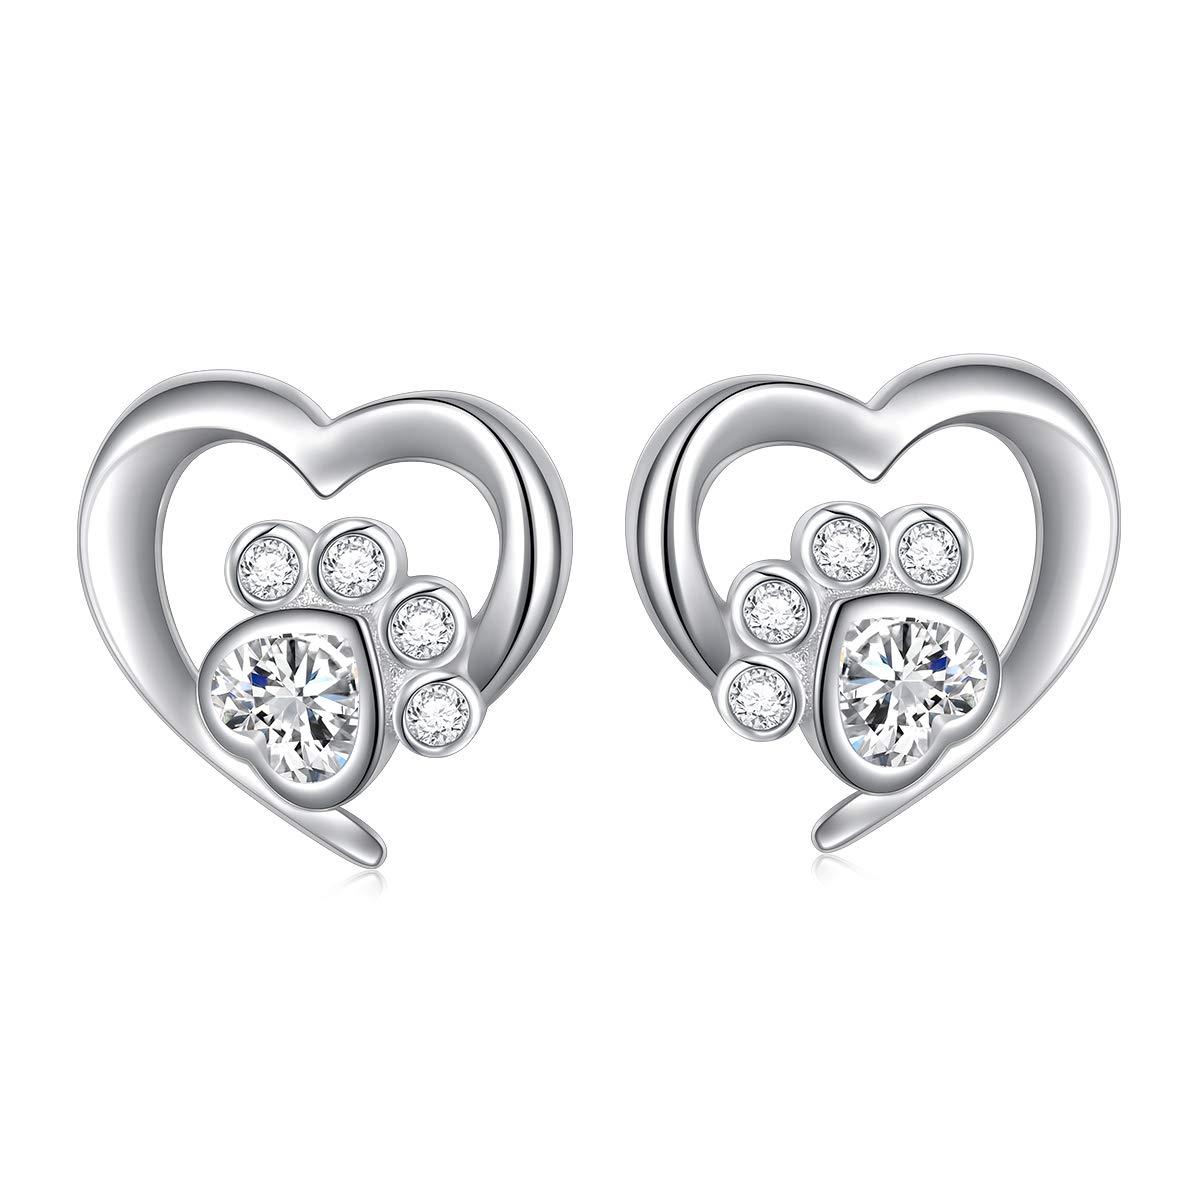 5f7df1002 925 Sterling Silver Cute Paw Print Forever Love Heart Pendant  Necklace/Bracelet/Stud Earrings Gift for Women Girls, Box Chain 18